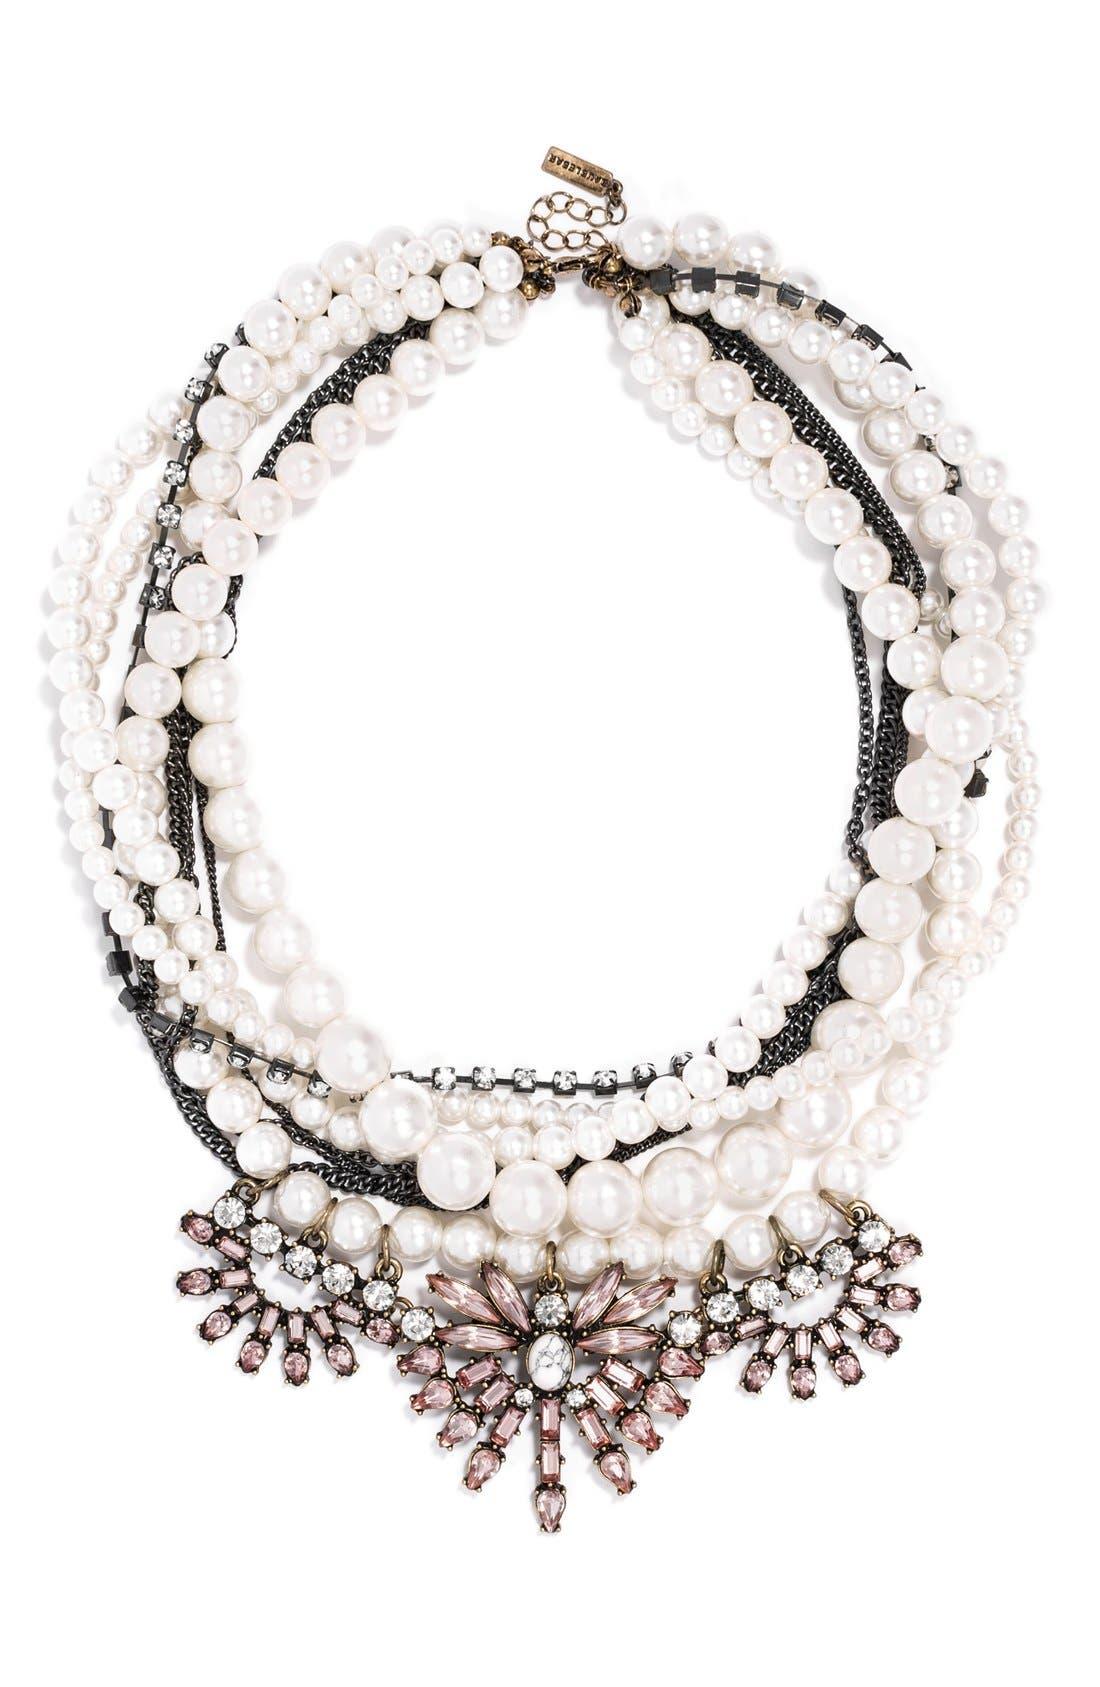 Alternate Image 1 Selected - BaubleBar 'Bennett' Layered Bib Necklace